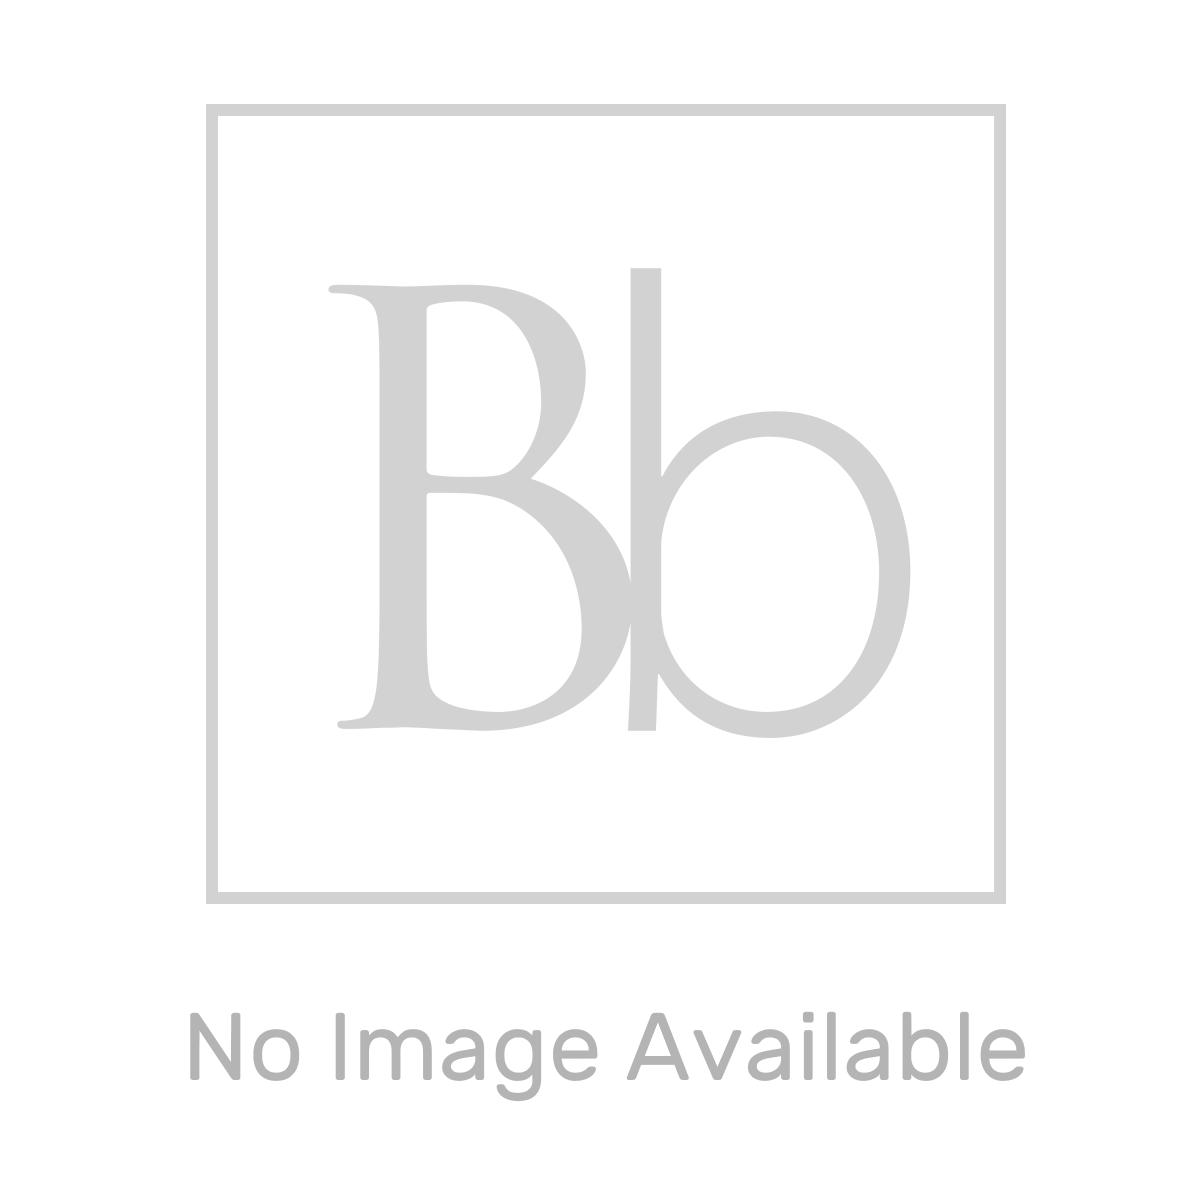 RAK Feeling Greige Square Single Outlet Thermostatic Shower Valve